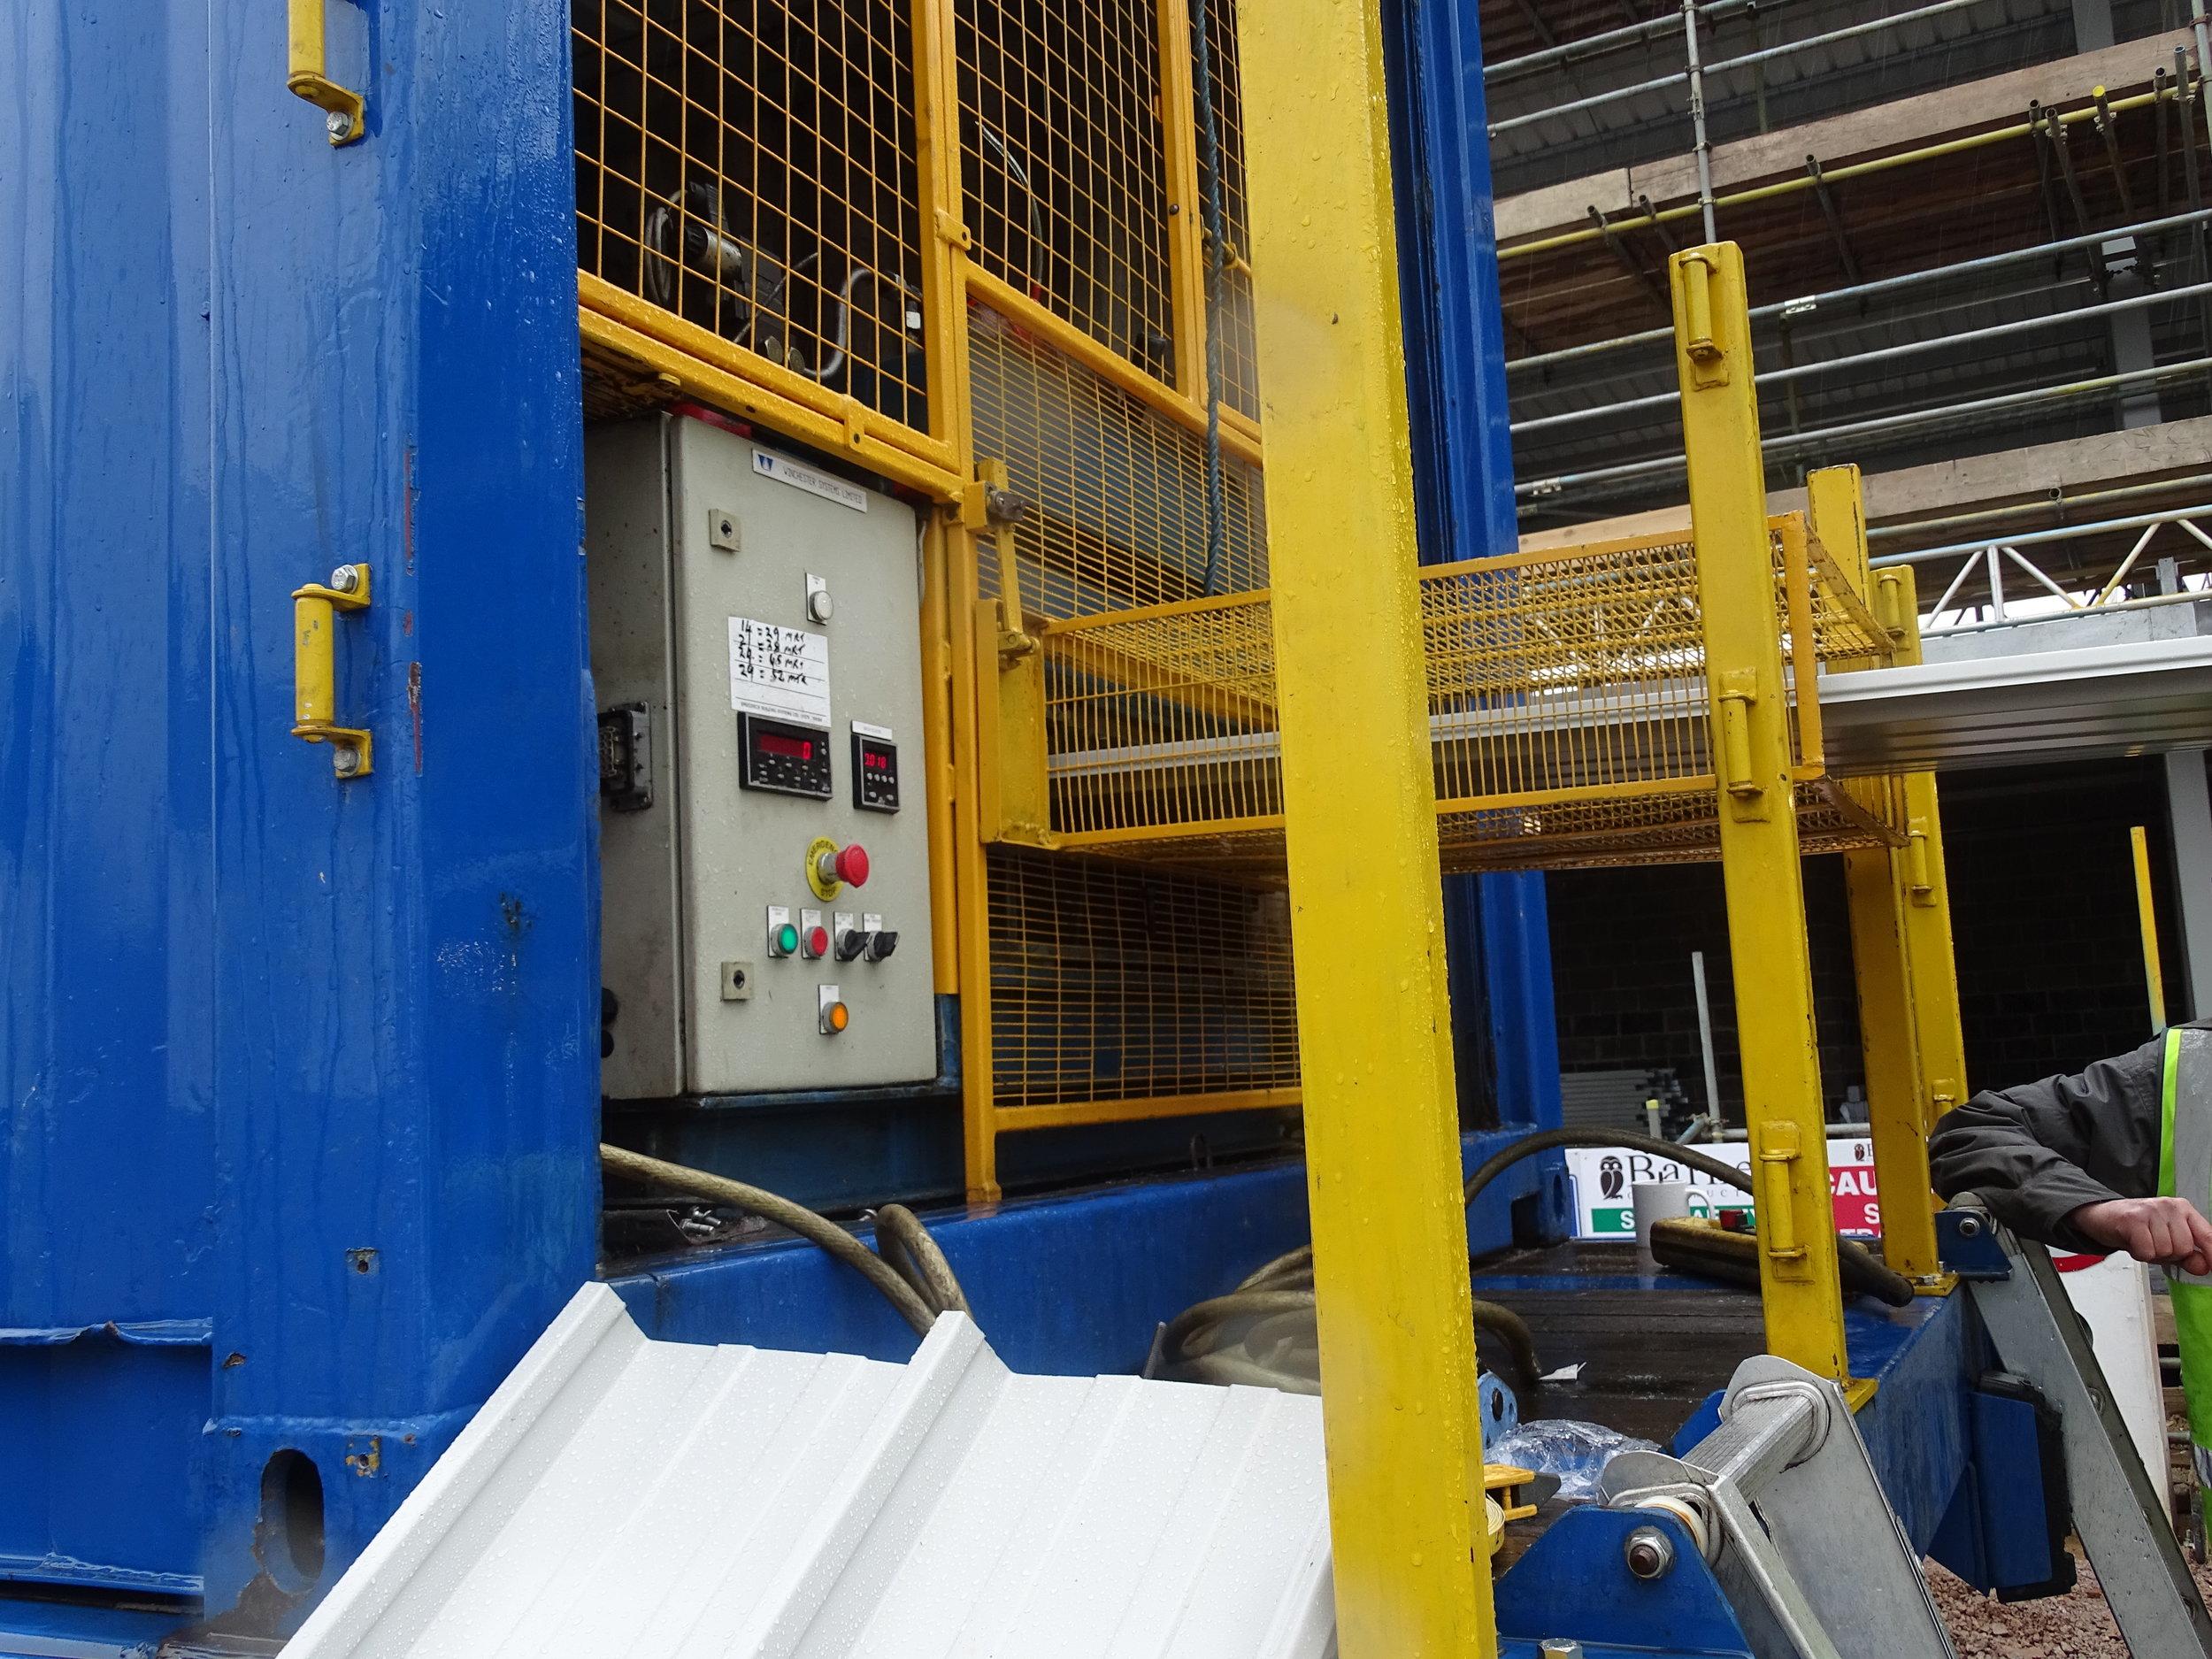 Omnis Exteriors onsite rolling equipment